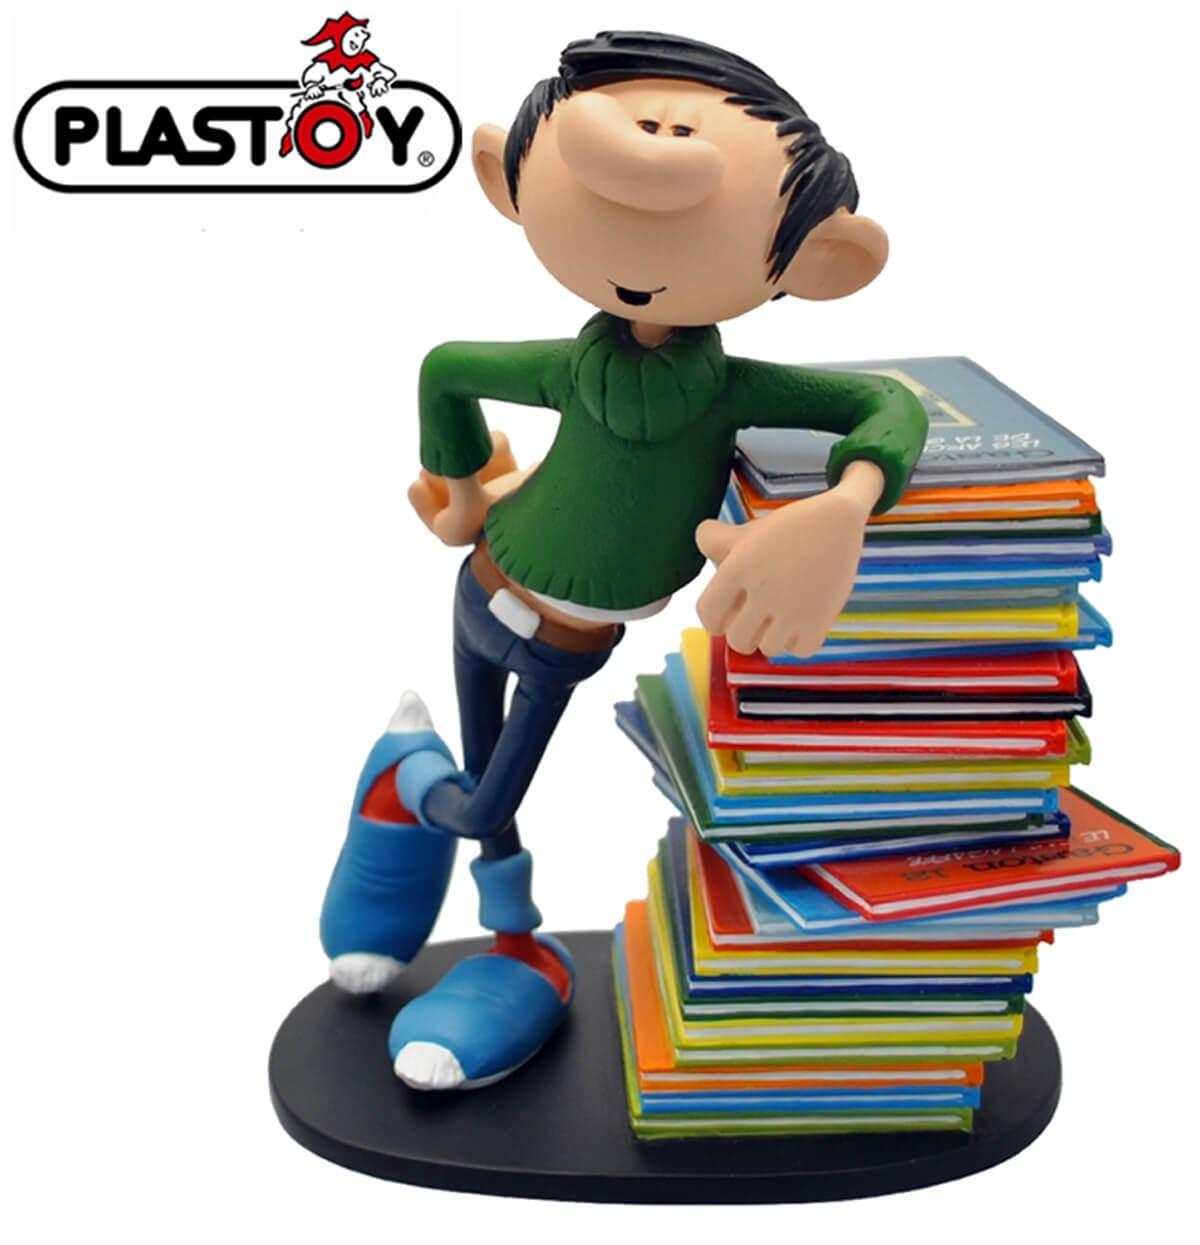 Collectoys - Gaston Pile d'Albums